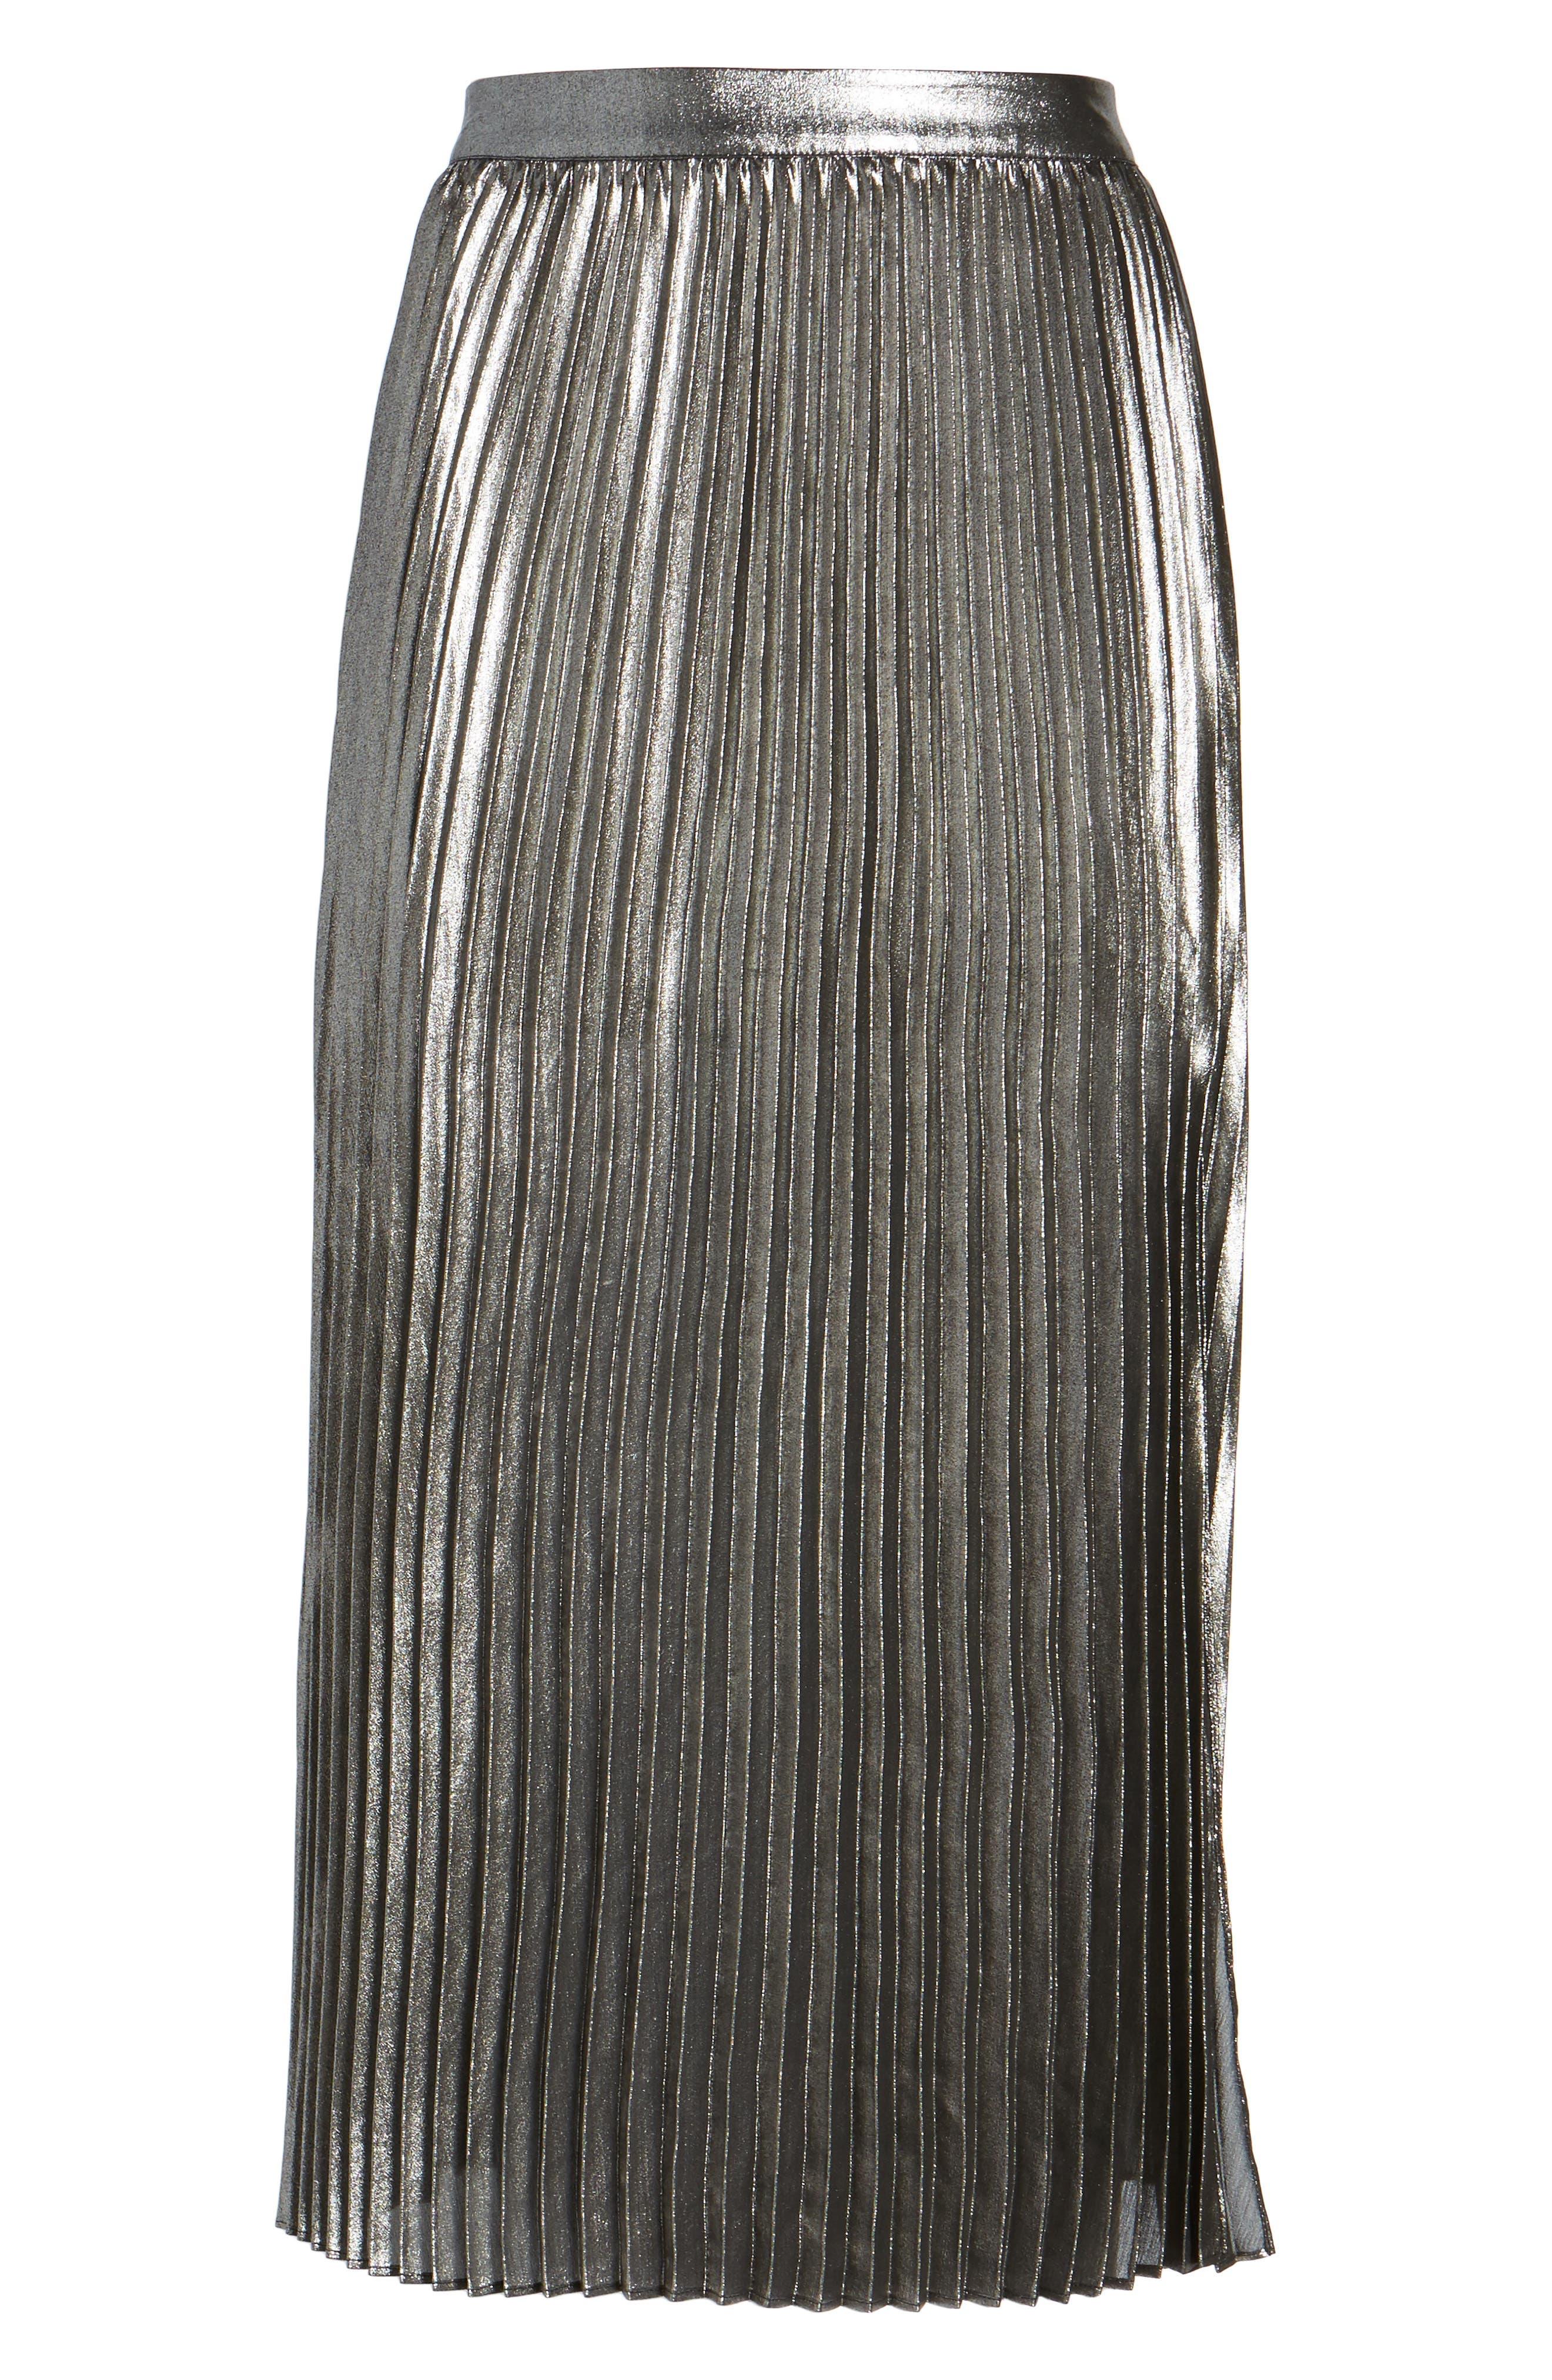 Metallic Pleated Skirt,                             Alternate thumbnail 6, color,                             040